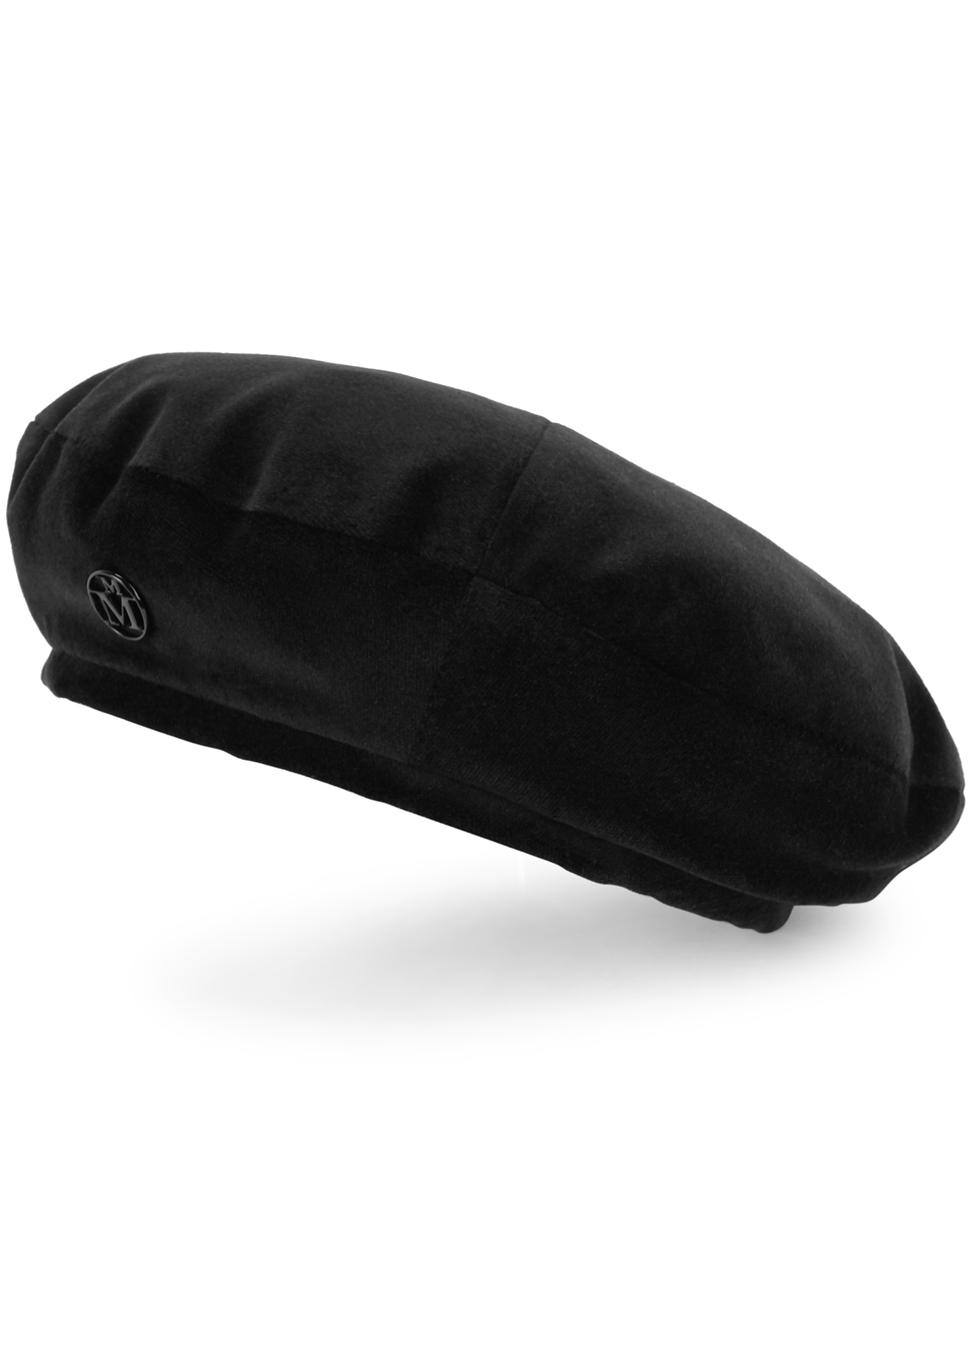 New Billy black cotton beret